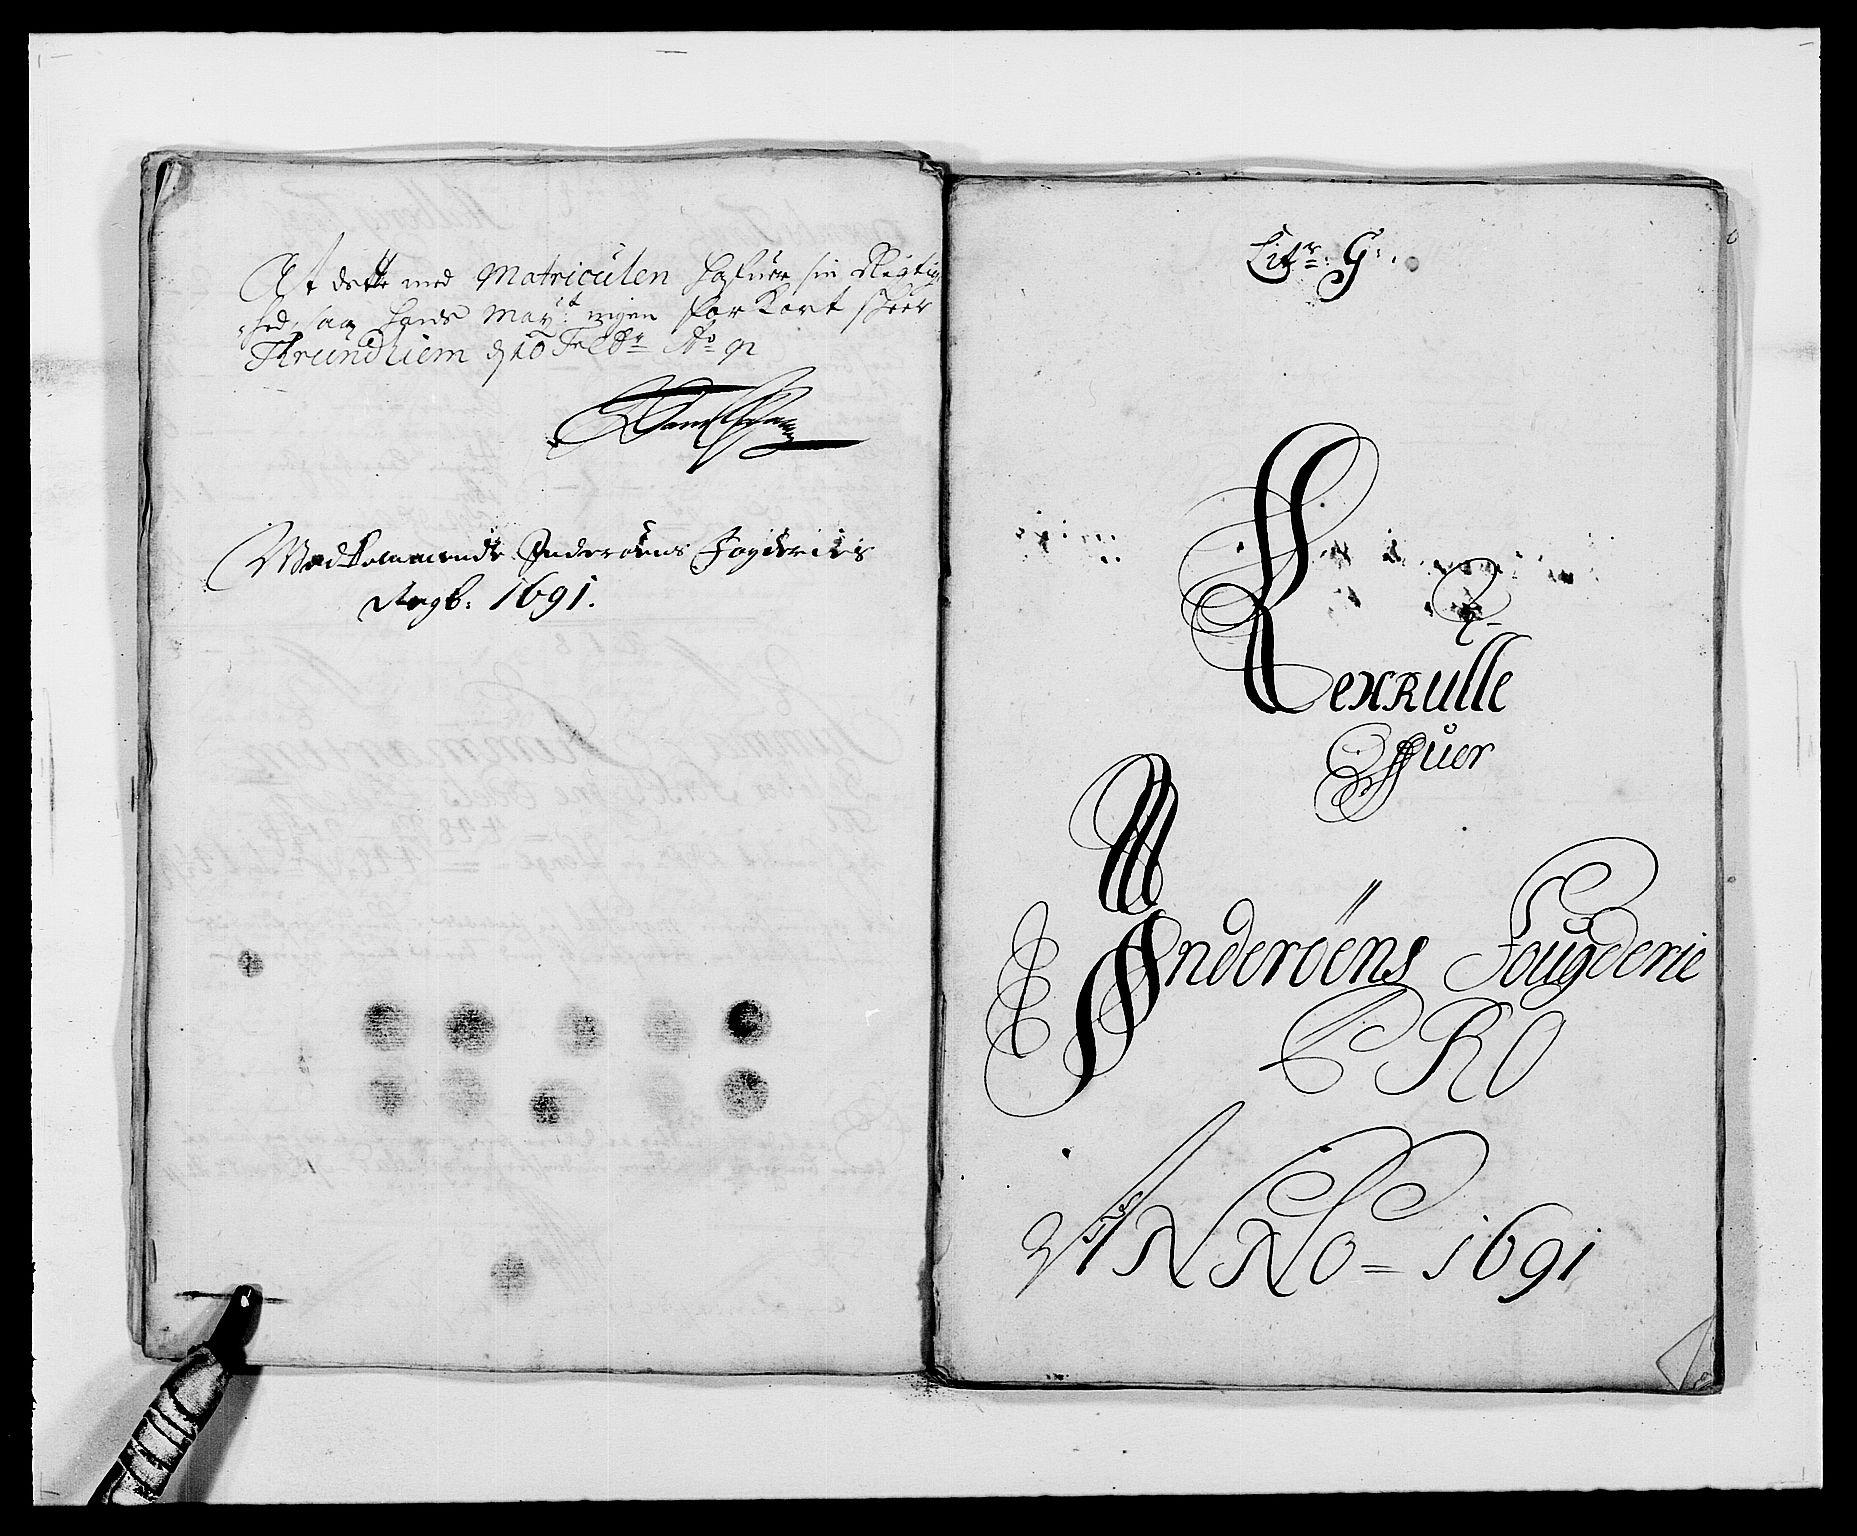 RA, Rentekammeret inntil 1814, Reviderte regnskaper, Fogderegnskap, R63/L4307: Fogderegnskap Inderøy, 1690-1691, s. 312